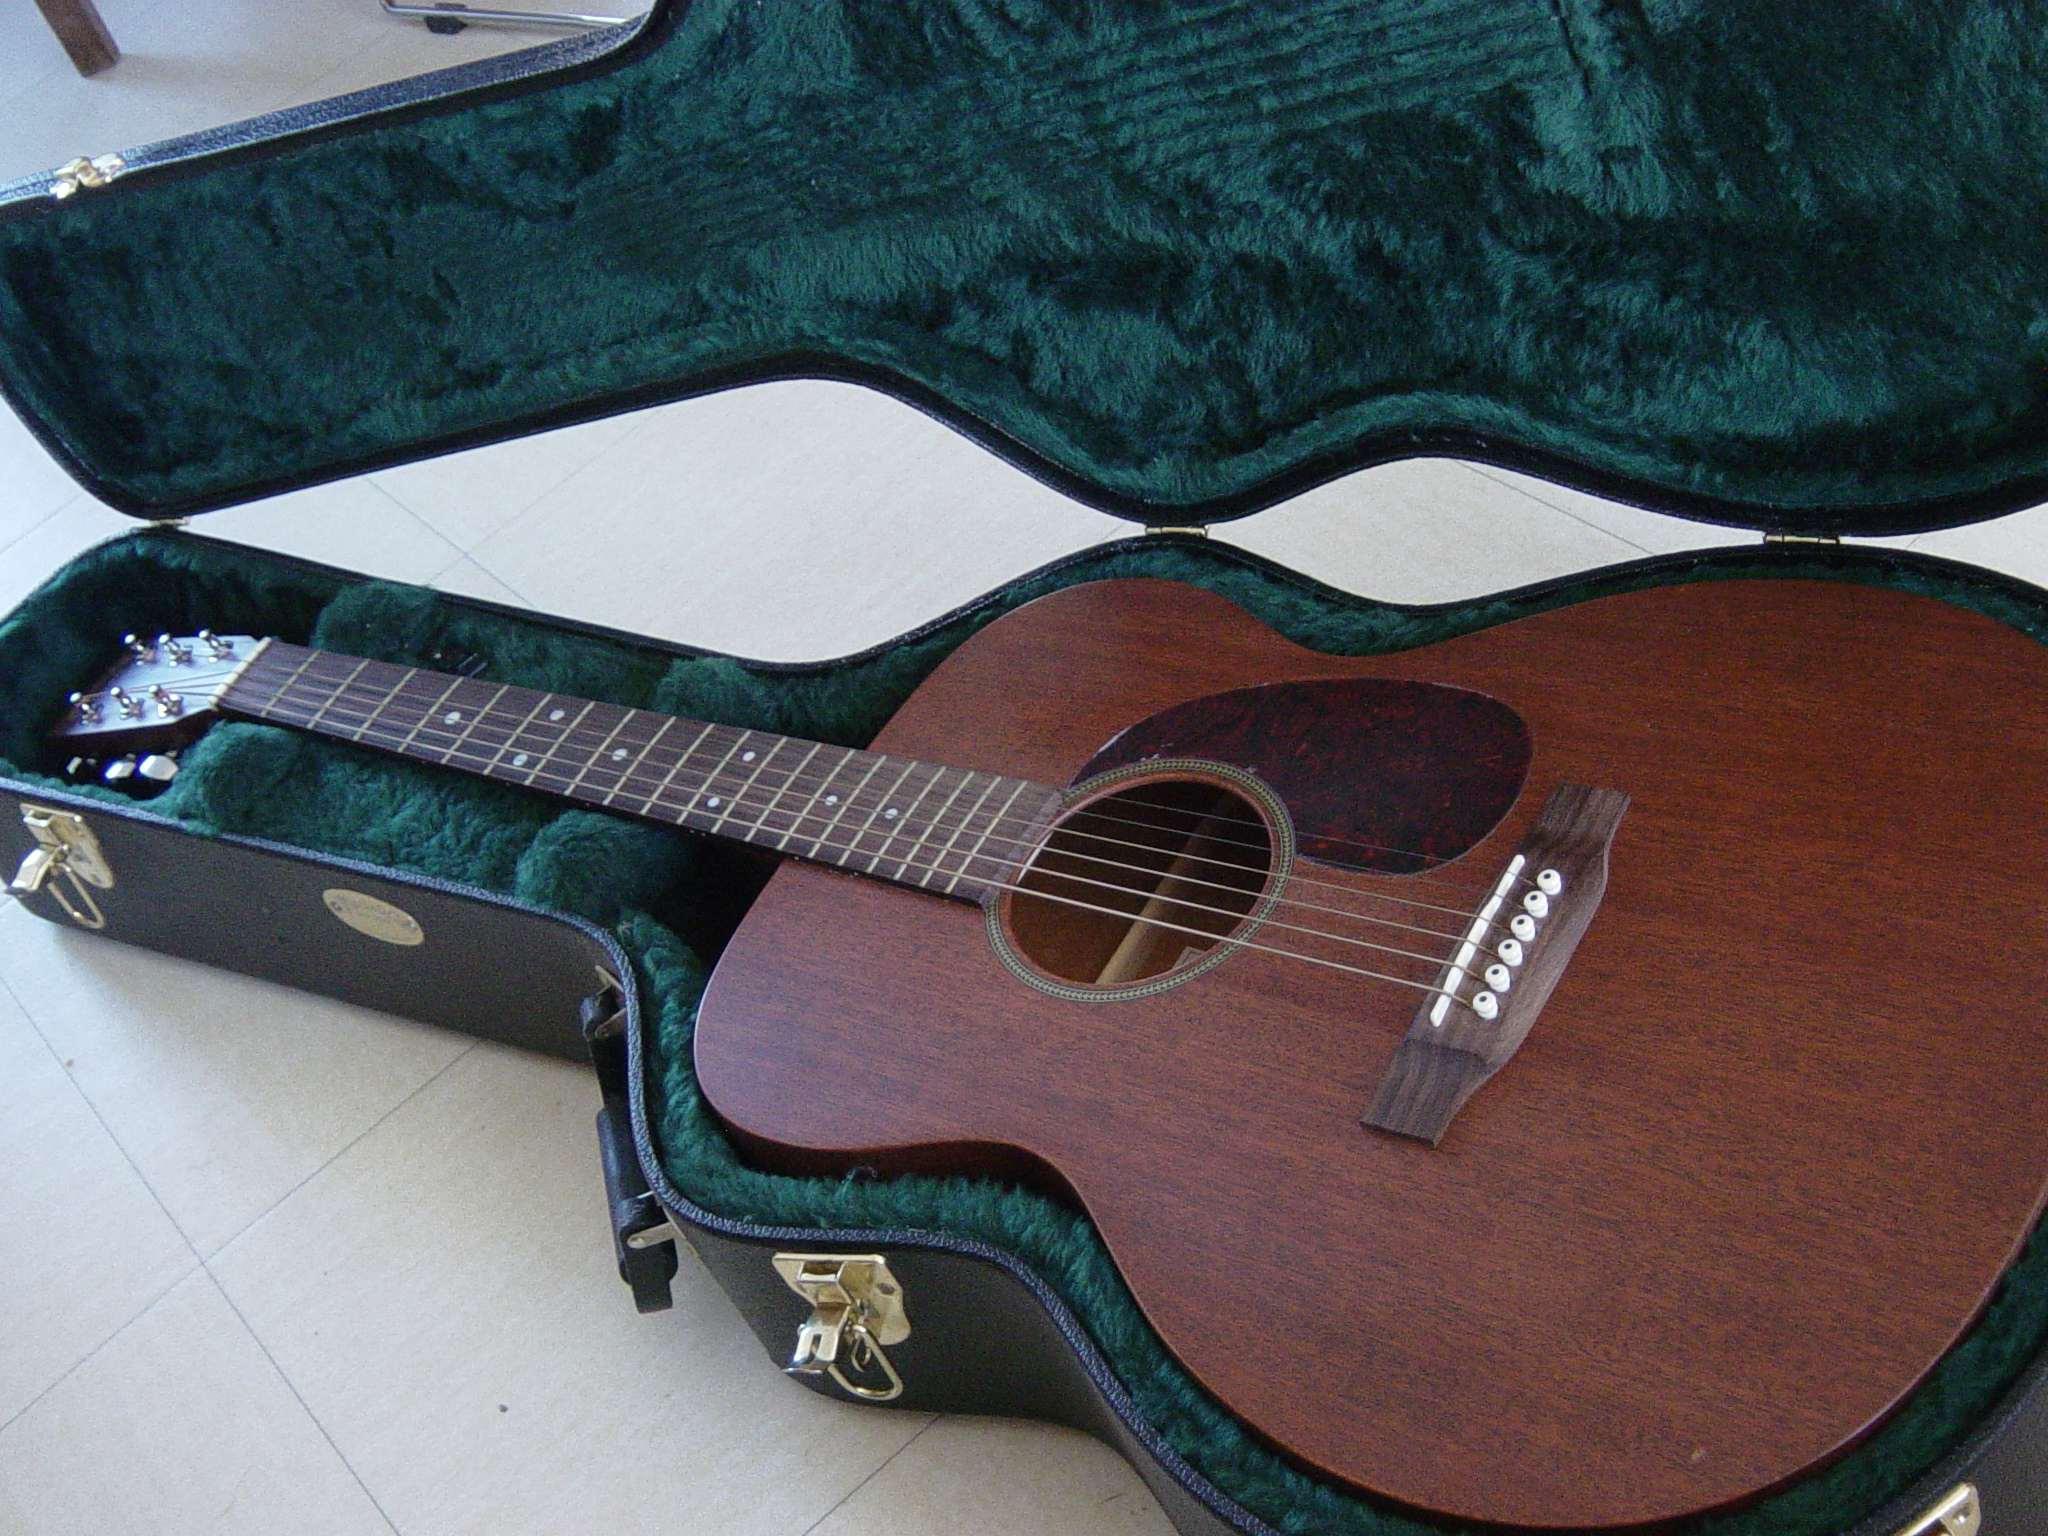 guitare martin 000 15 quasi neuve tui petite annonce. Black Bedroom Furniture Sets. Home Design Ideas